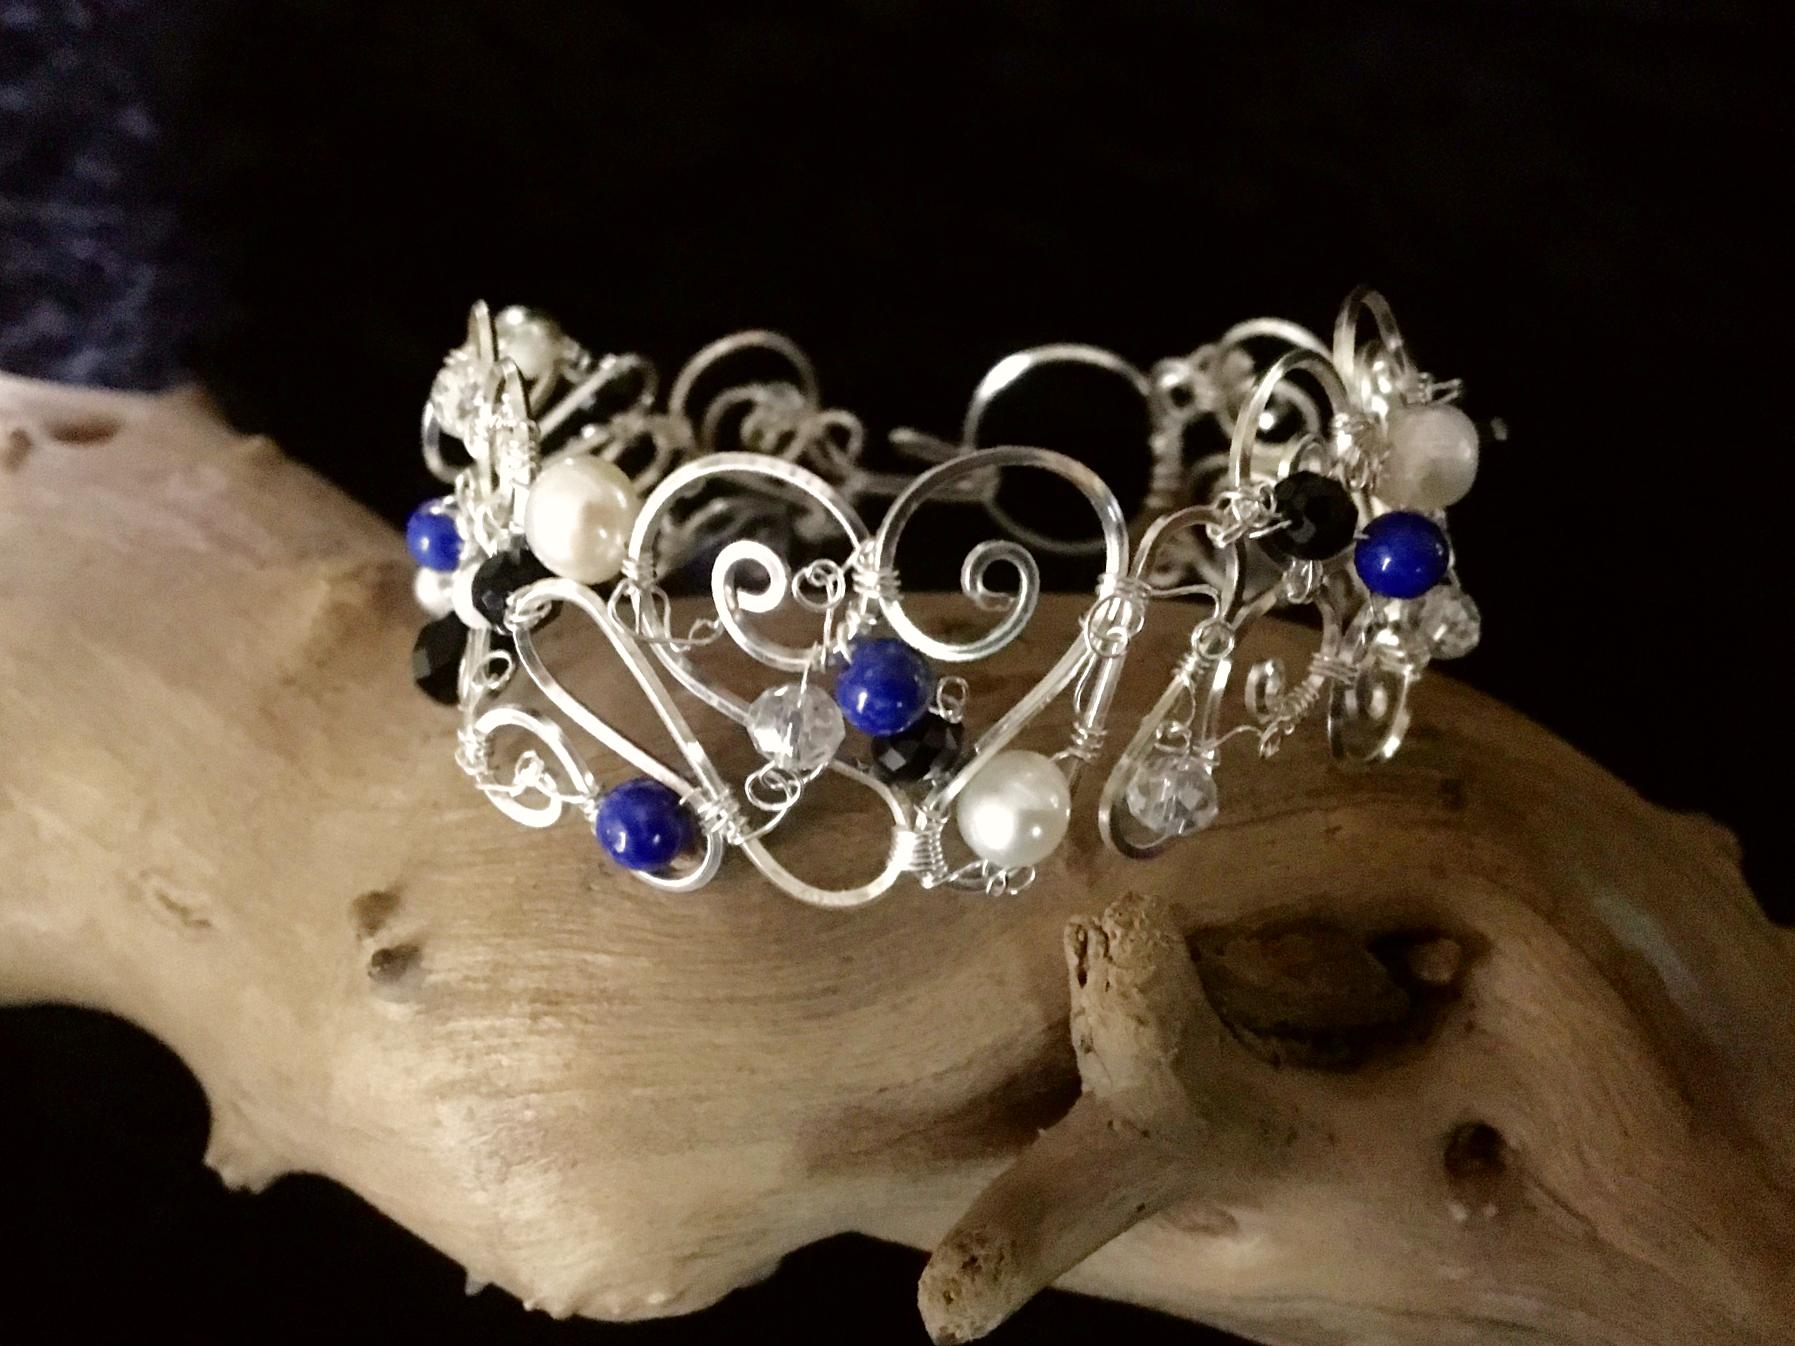 Dainty Deva Bracelet - Pearls and Lapis Lazuli  - Silver Plated